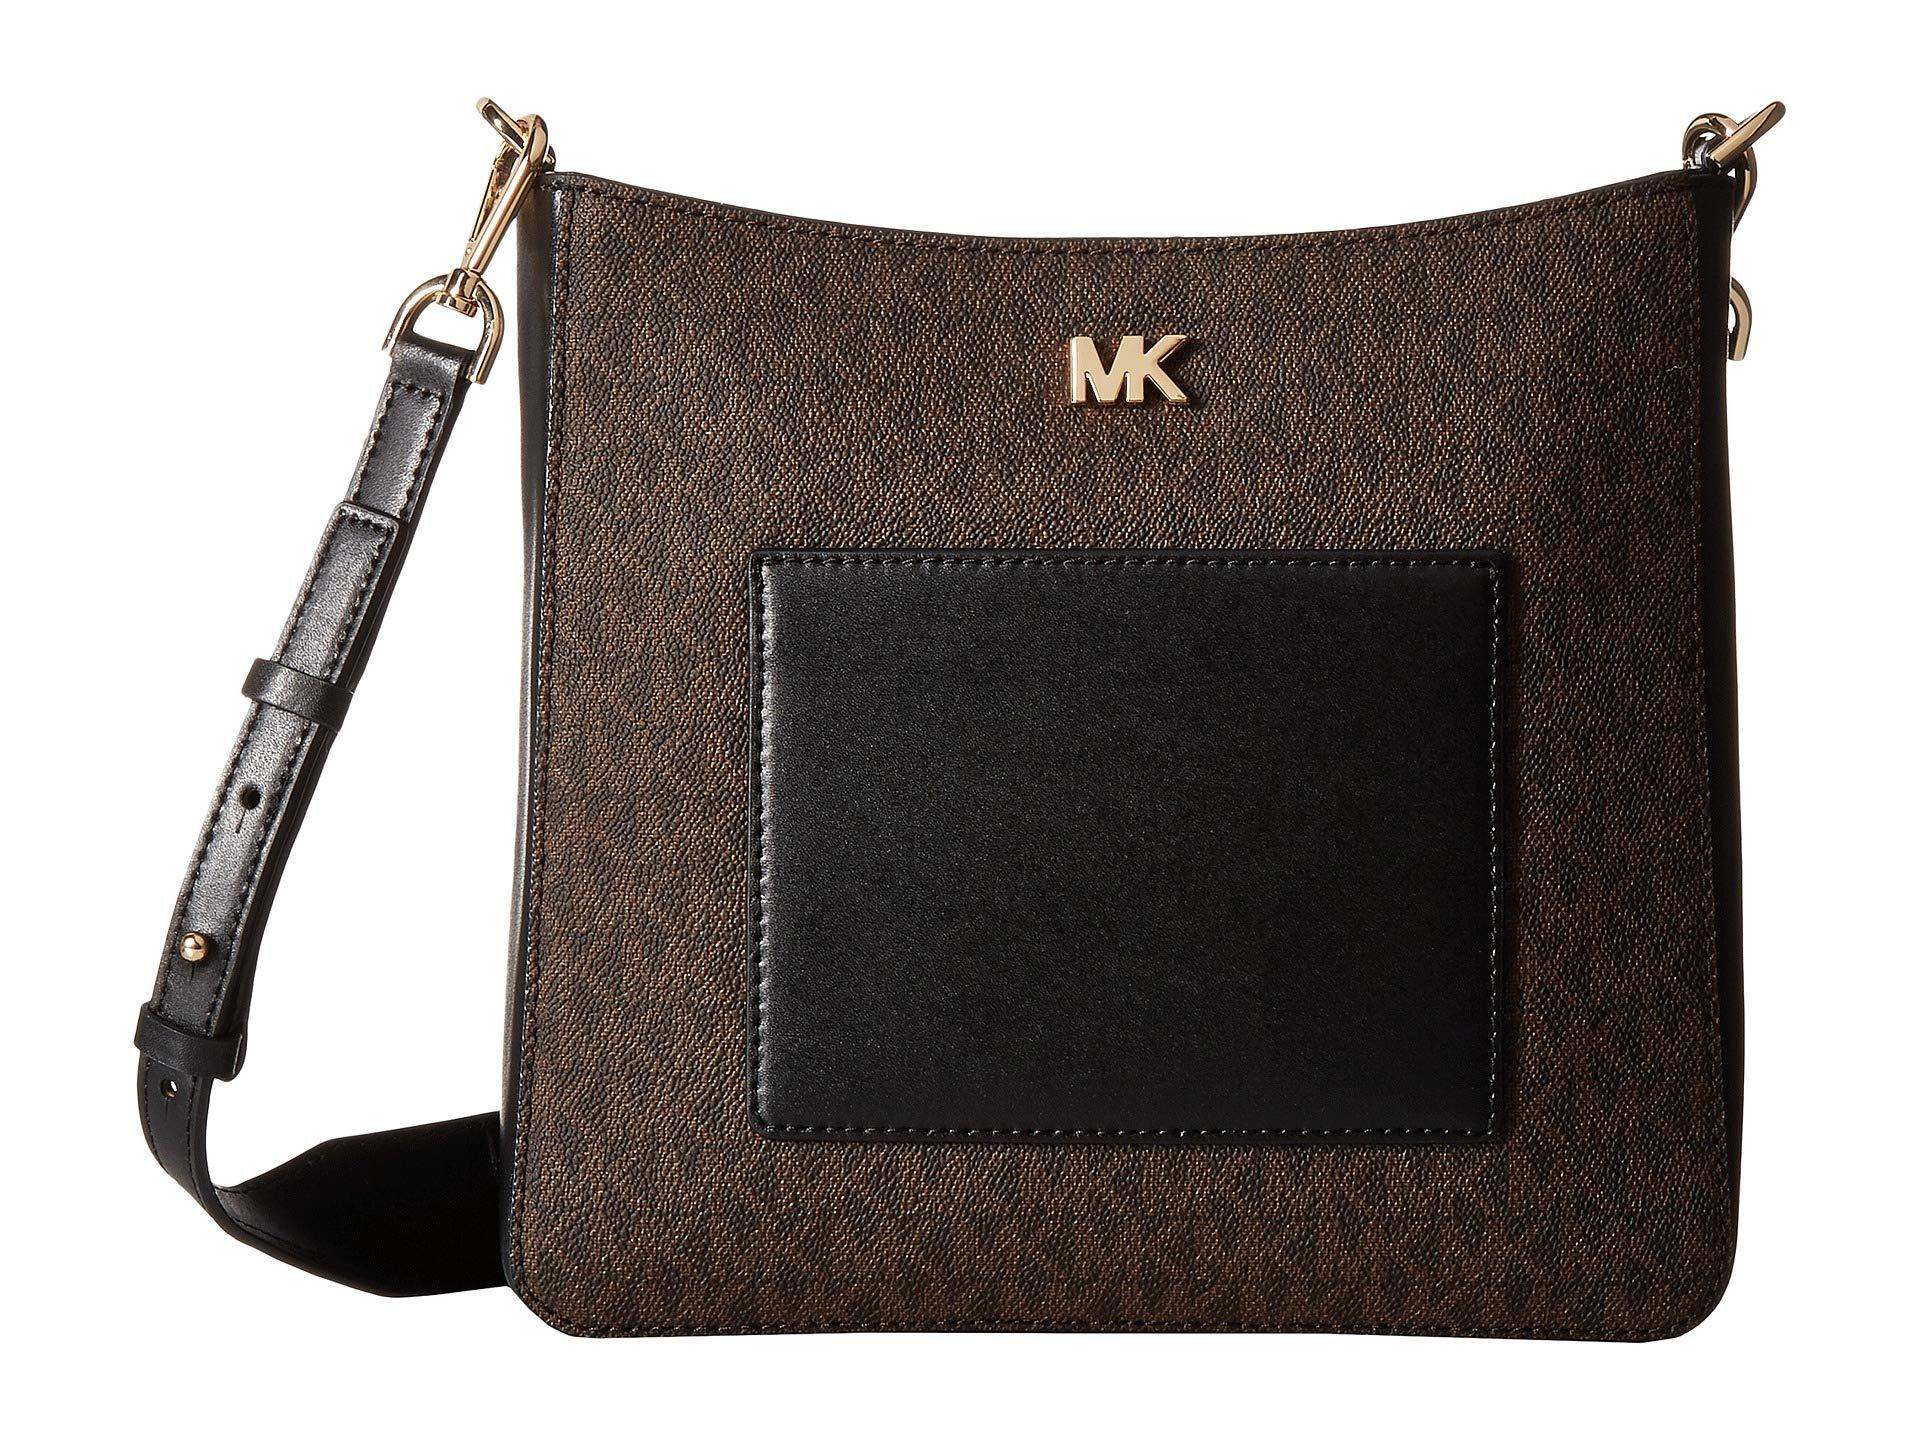 d03adc58e20d MICHAEL Michael Kors Gloria Pocket Swing Pack in Black - Save 4% - Lyst